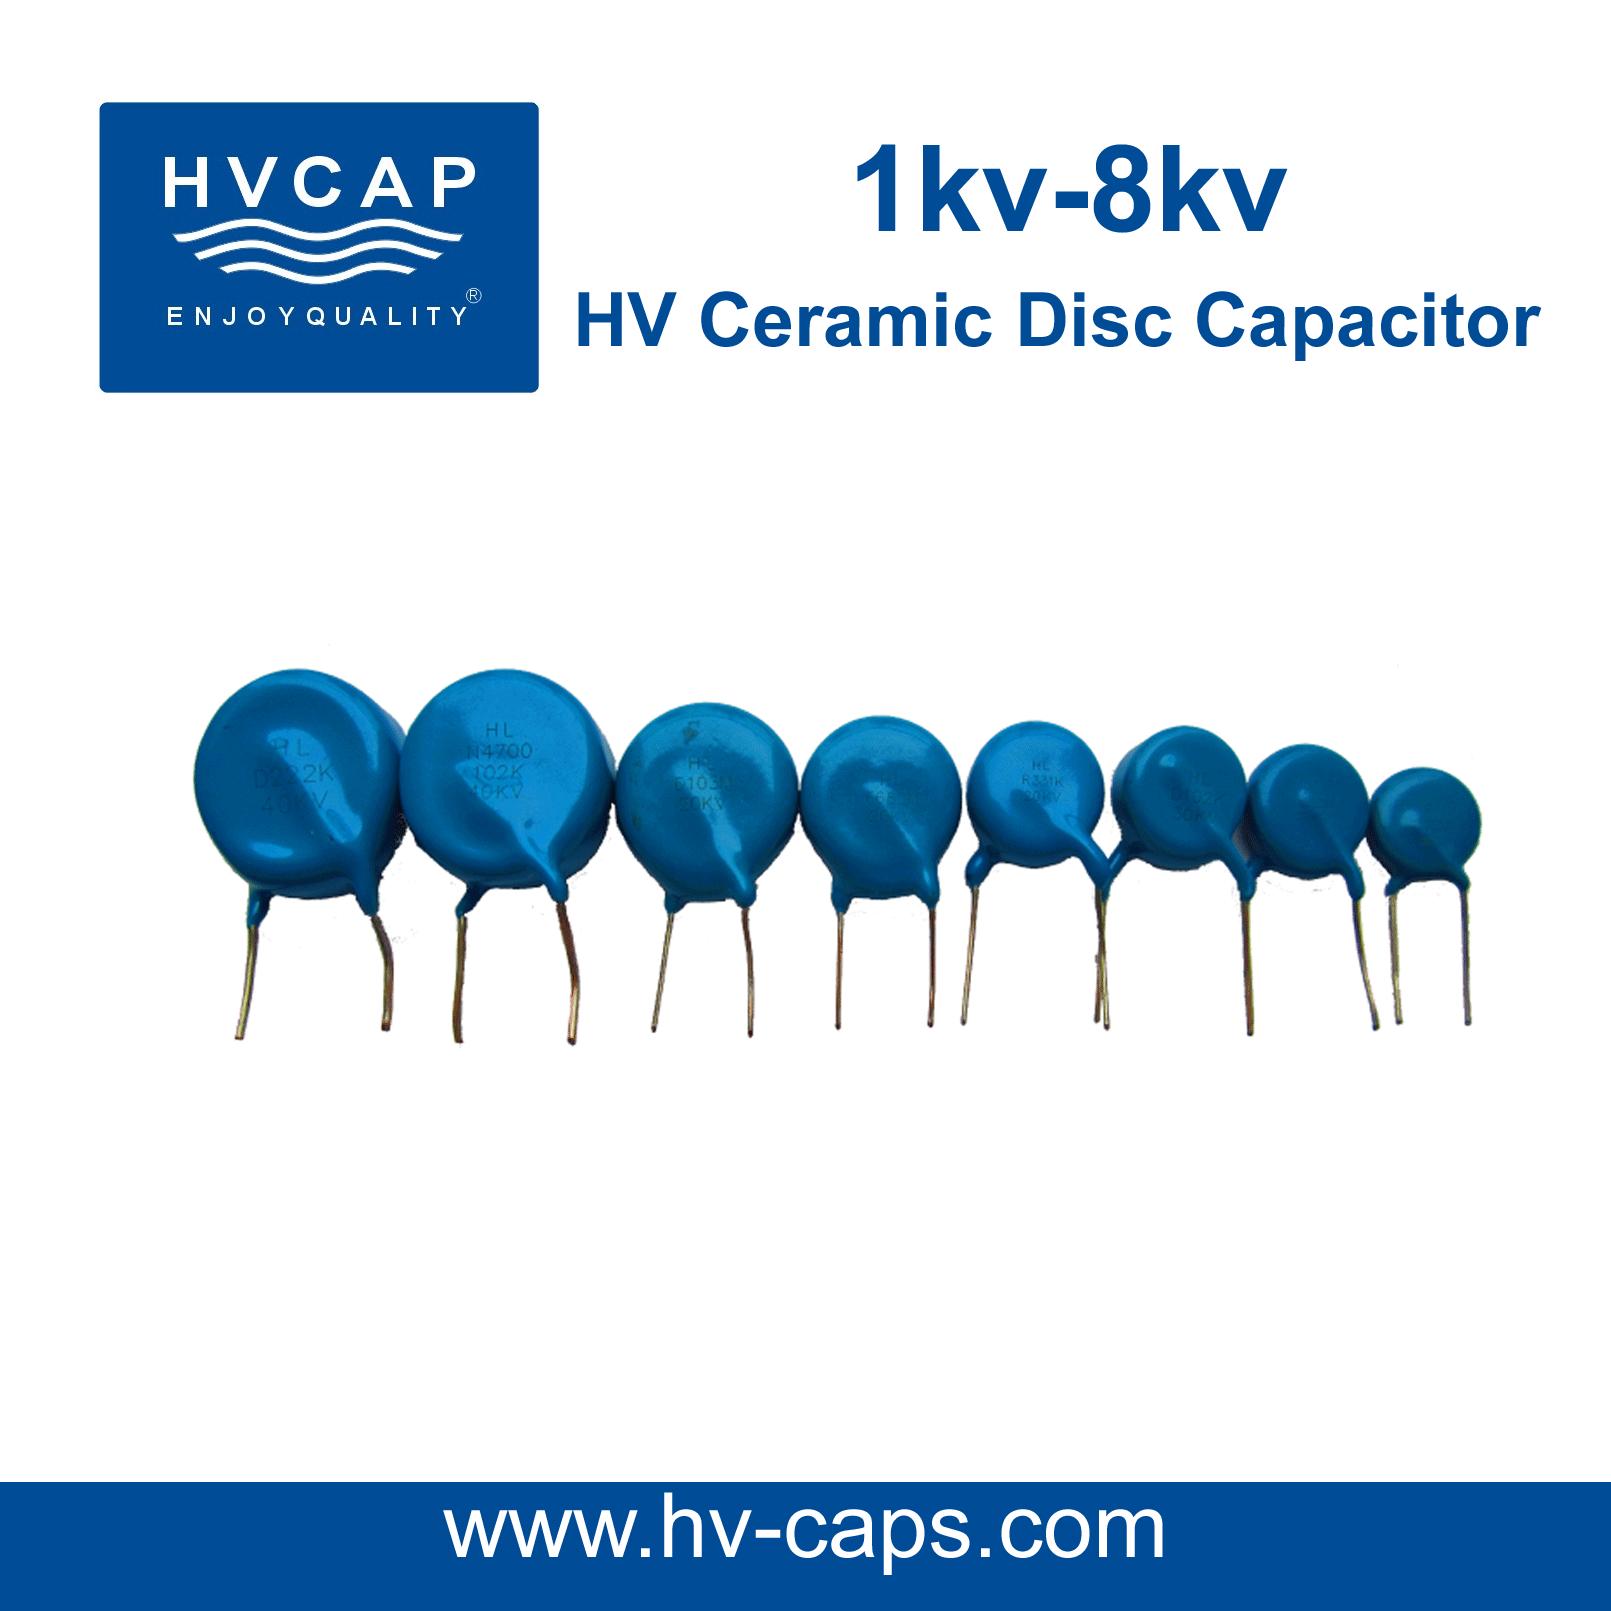 HV সিরামিক ক্যাপাসিটরের 1kv থেকে 8kv, বিস্তারিত স্পেসিফিকেশন।